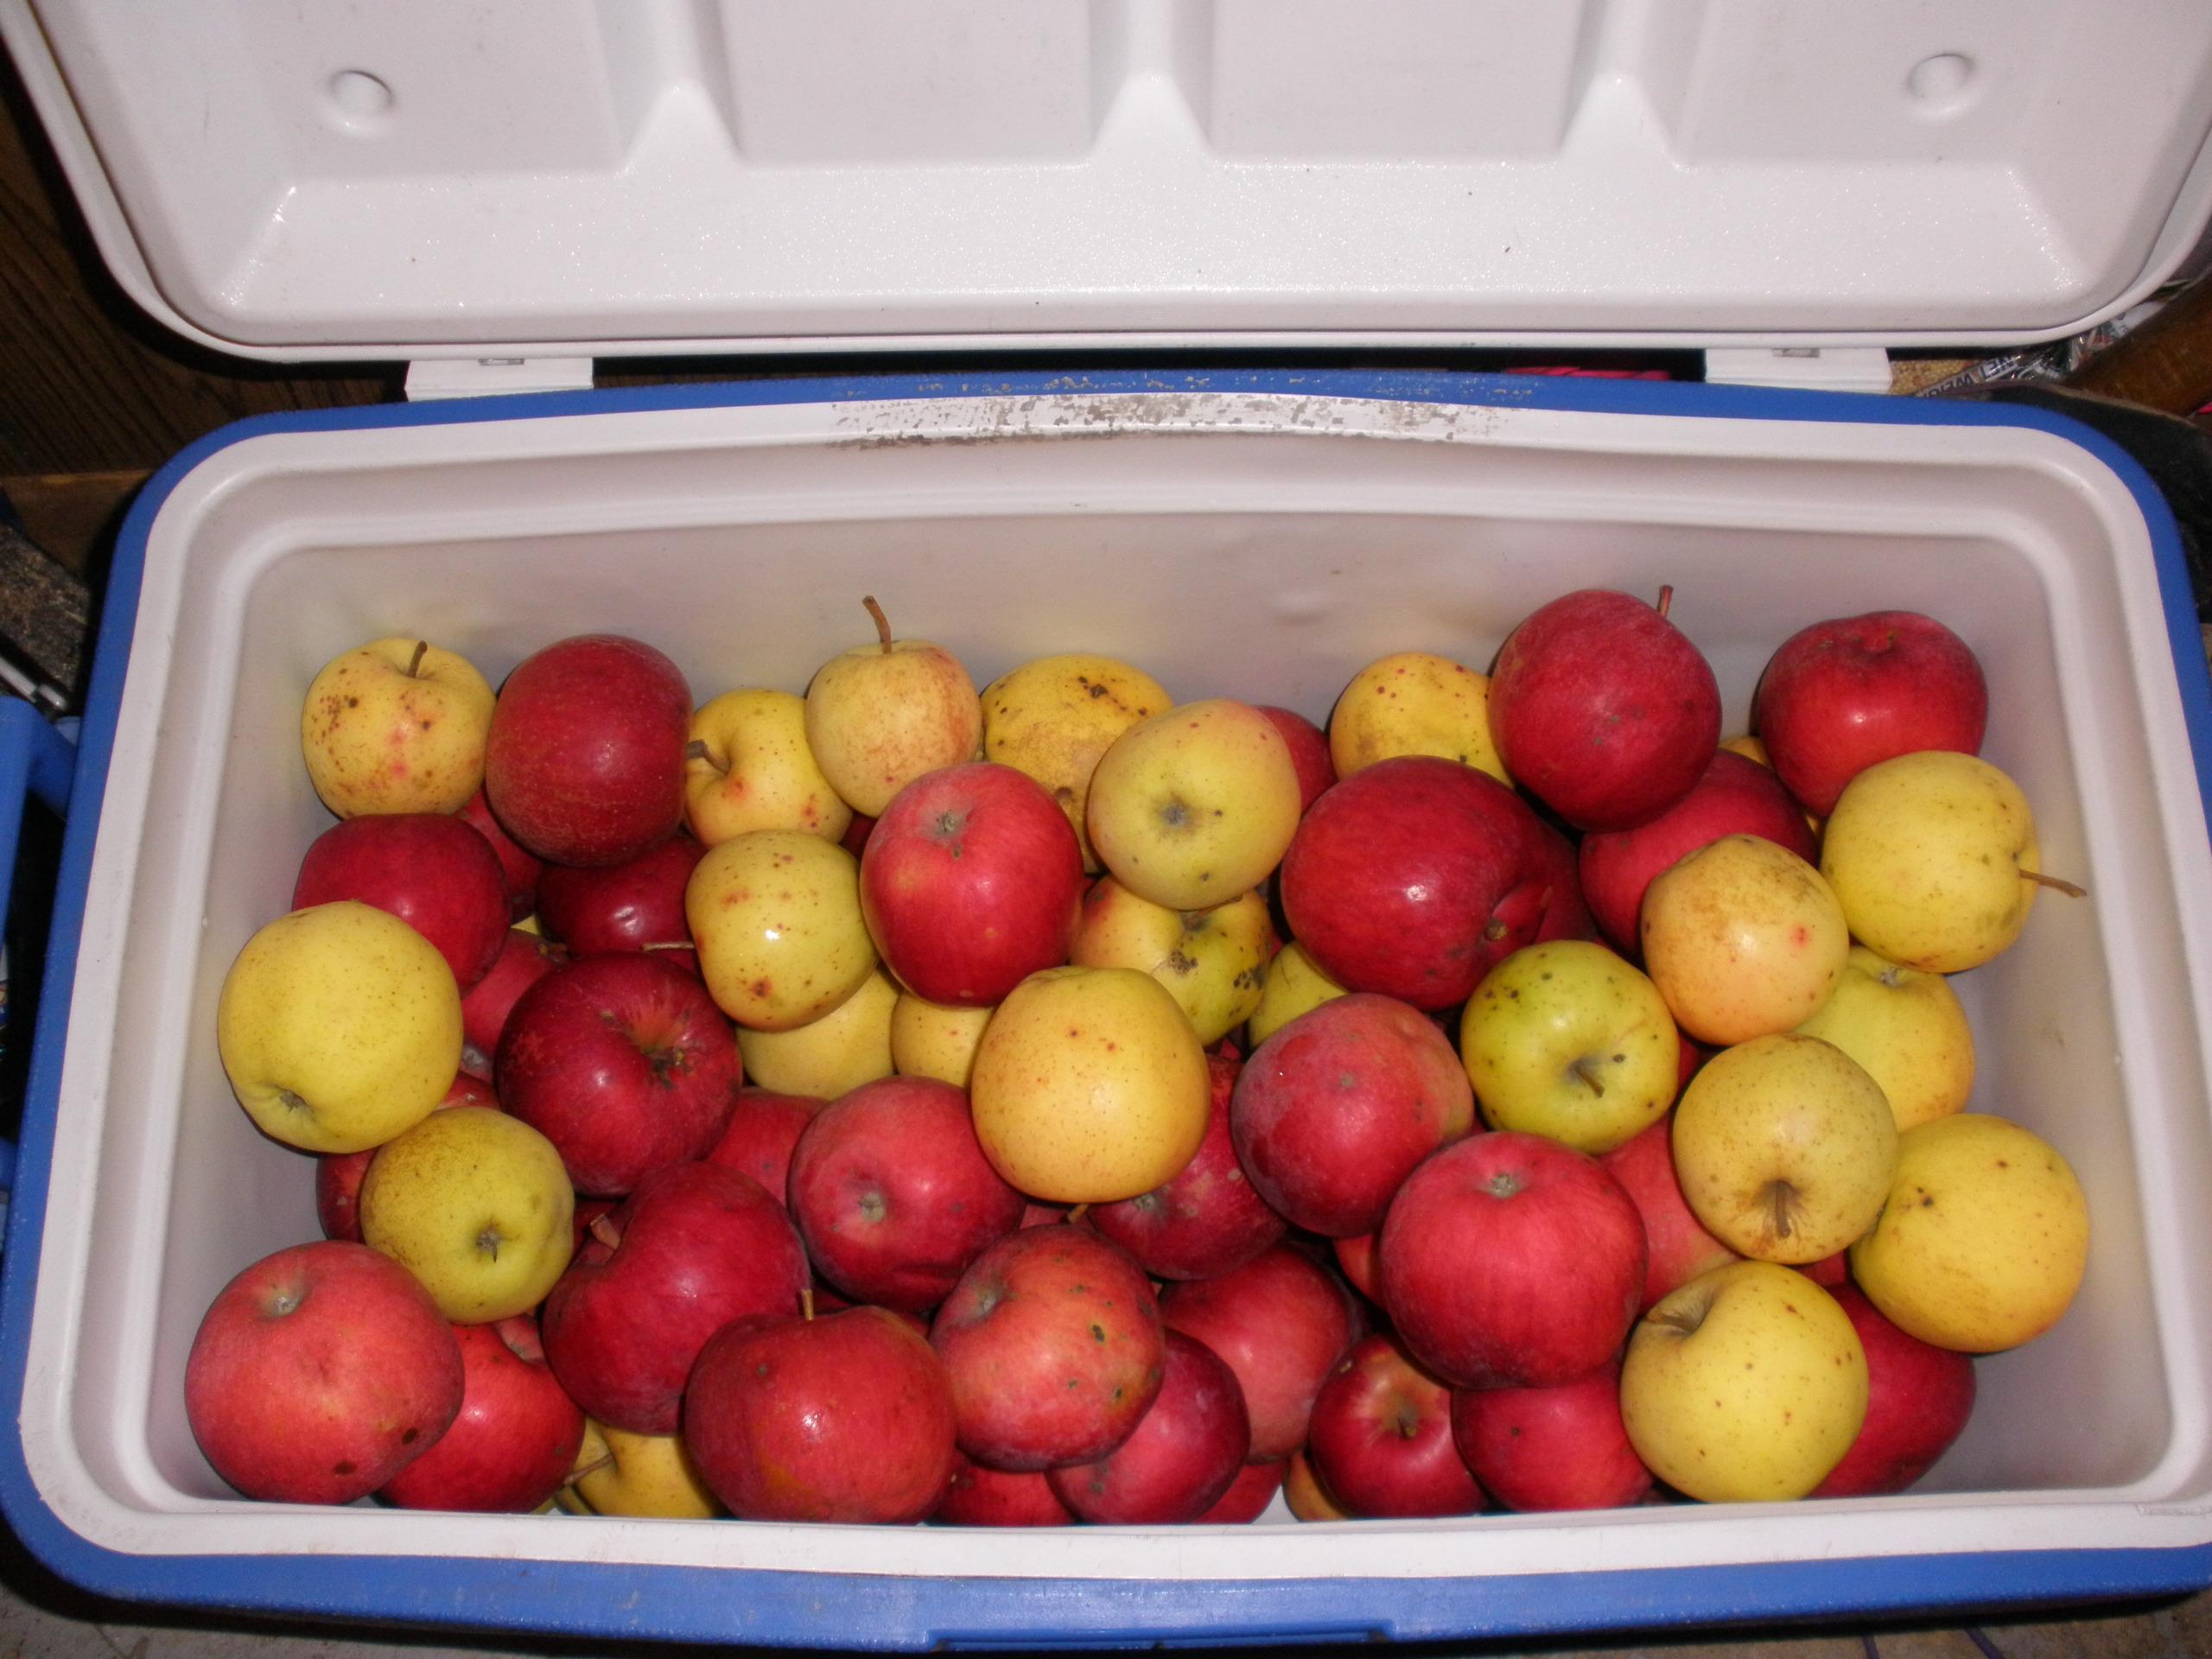 Over a bushel of apples